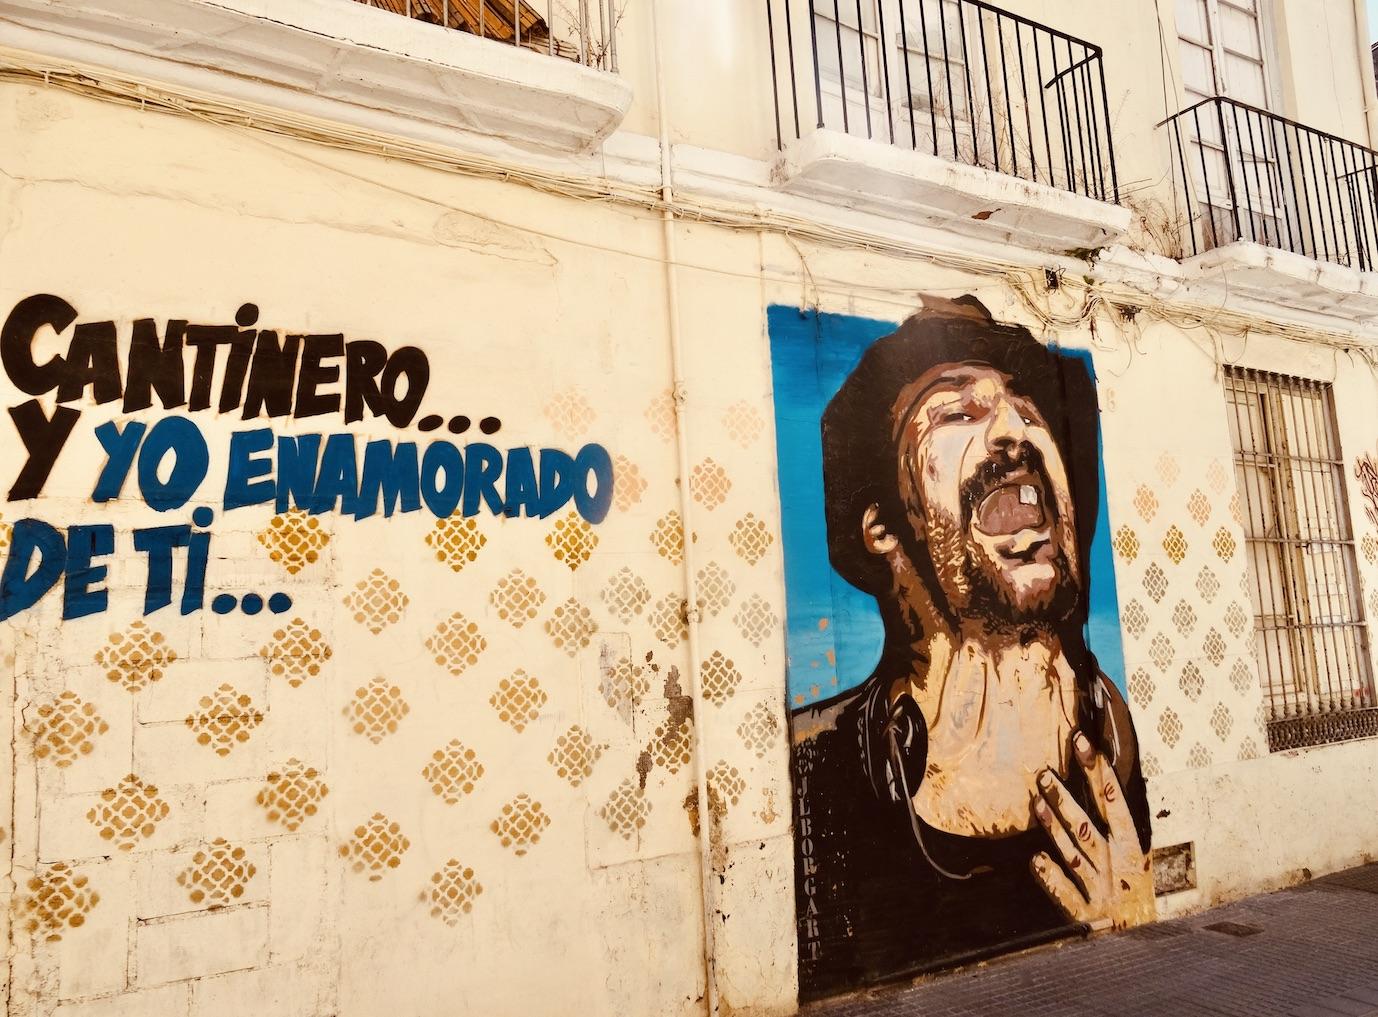 El Chamorro Singer mural Malaga.